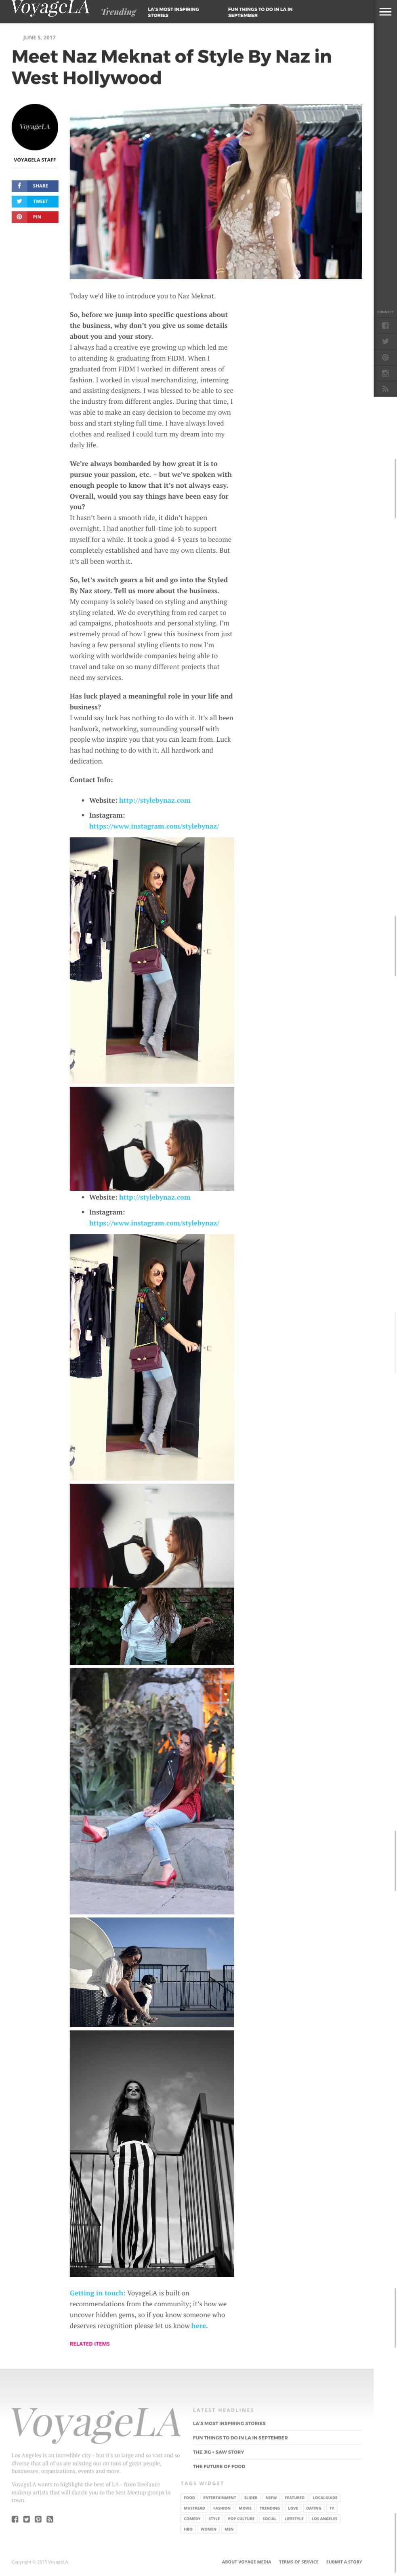 VoyageLA: Meet Naz Meknat of Style By Naz in West Hollywood